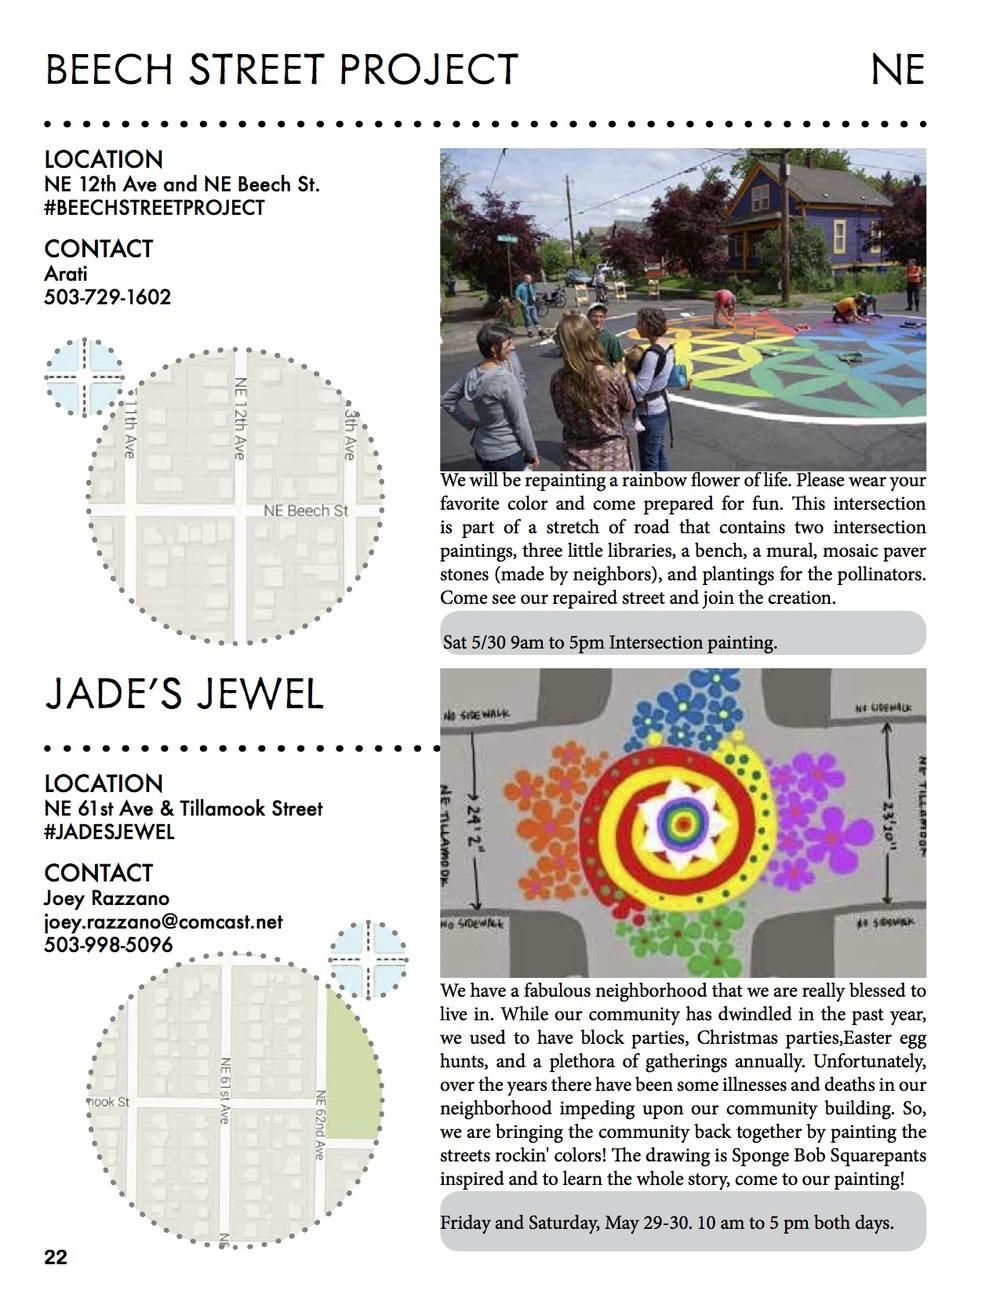 Beech Street Project / Jades Jewel